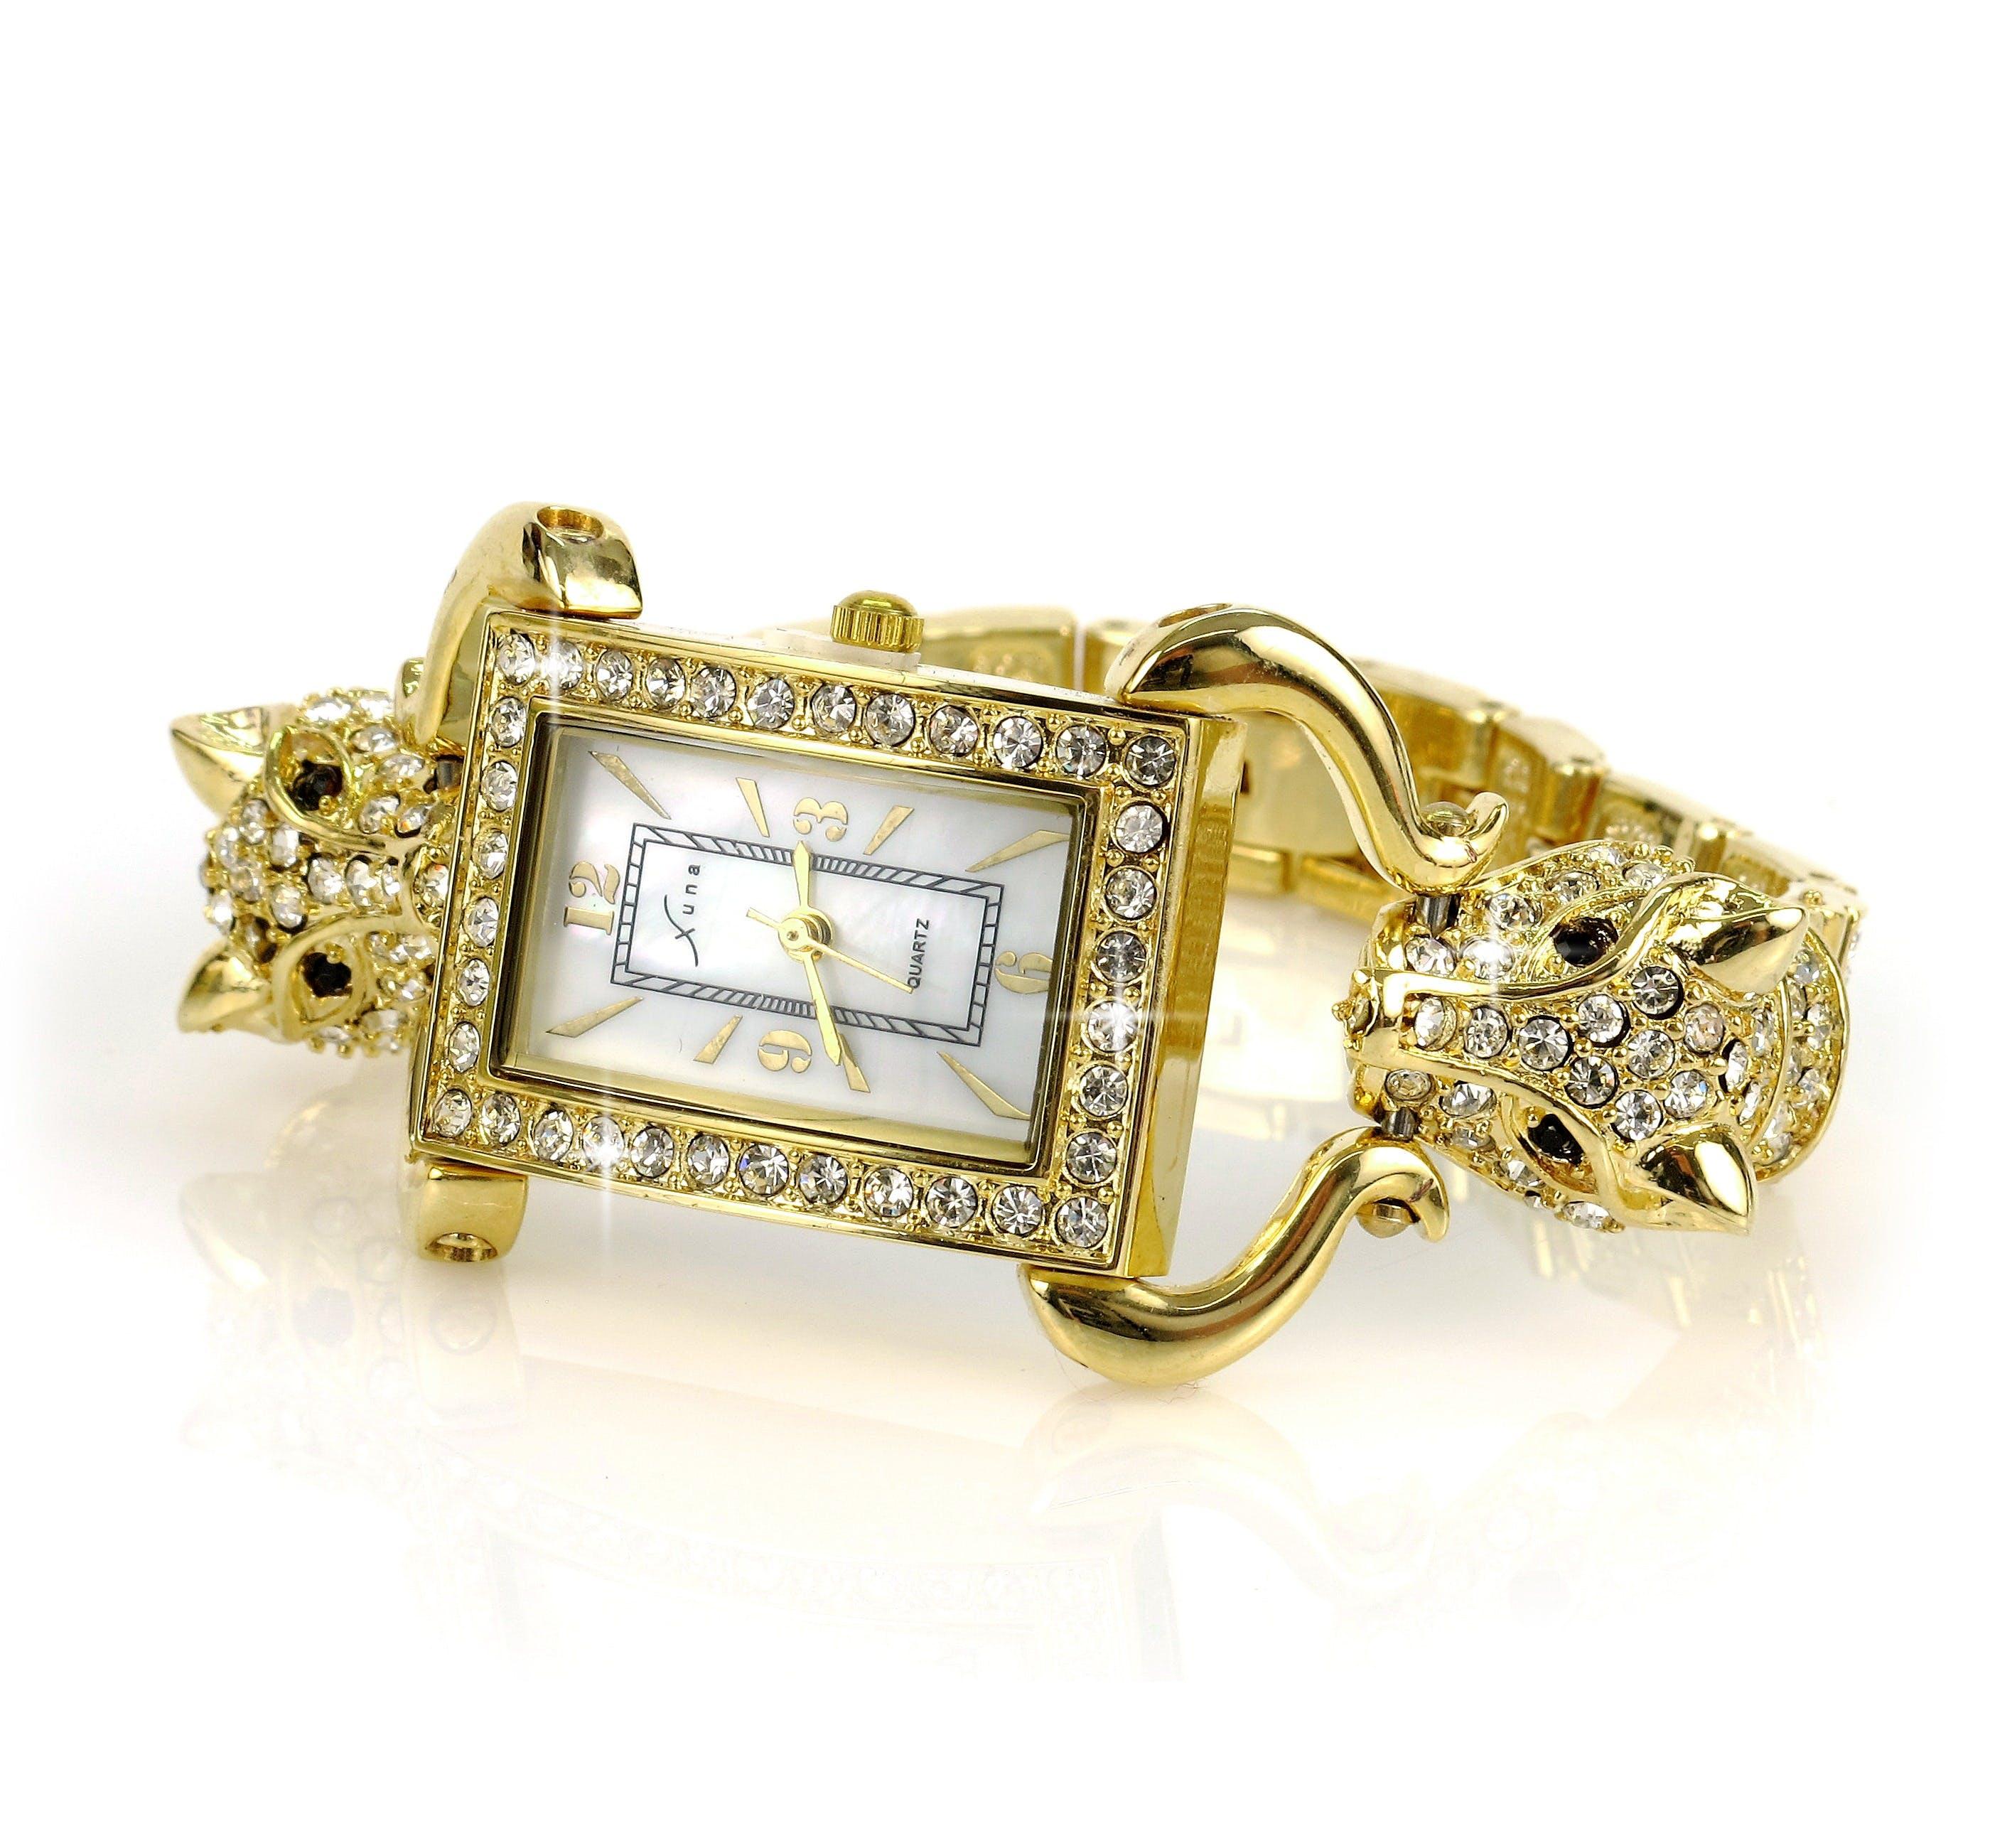 Gold Link Diamond Studded Analog Watch